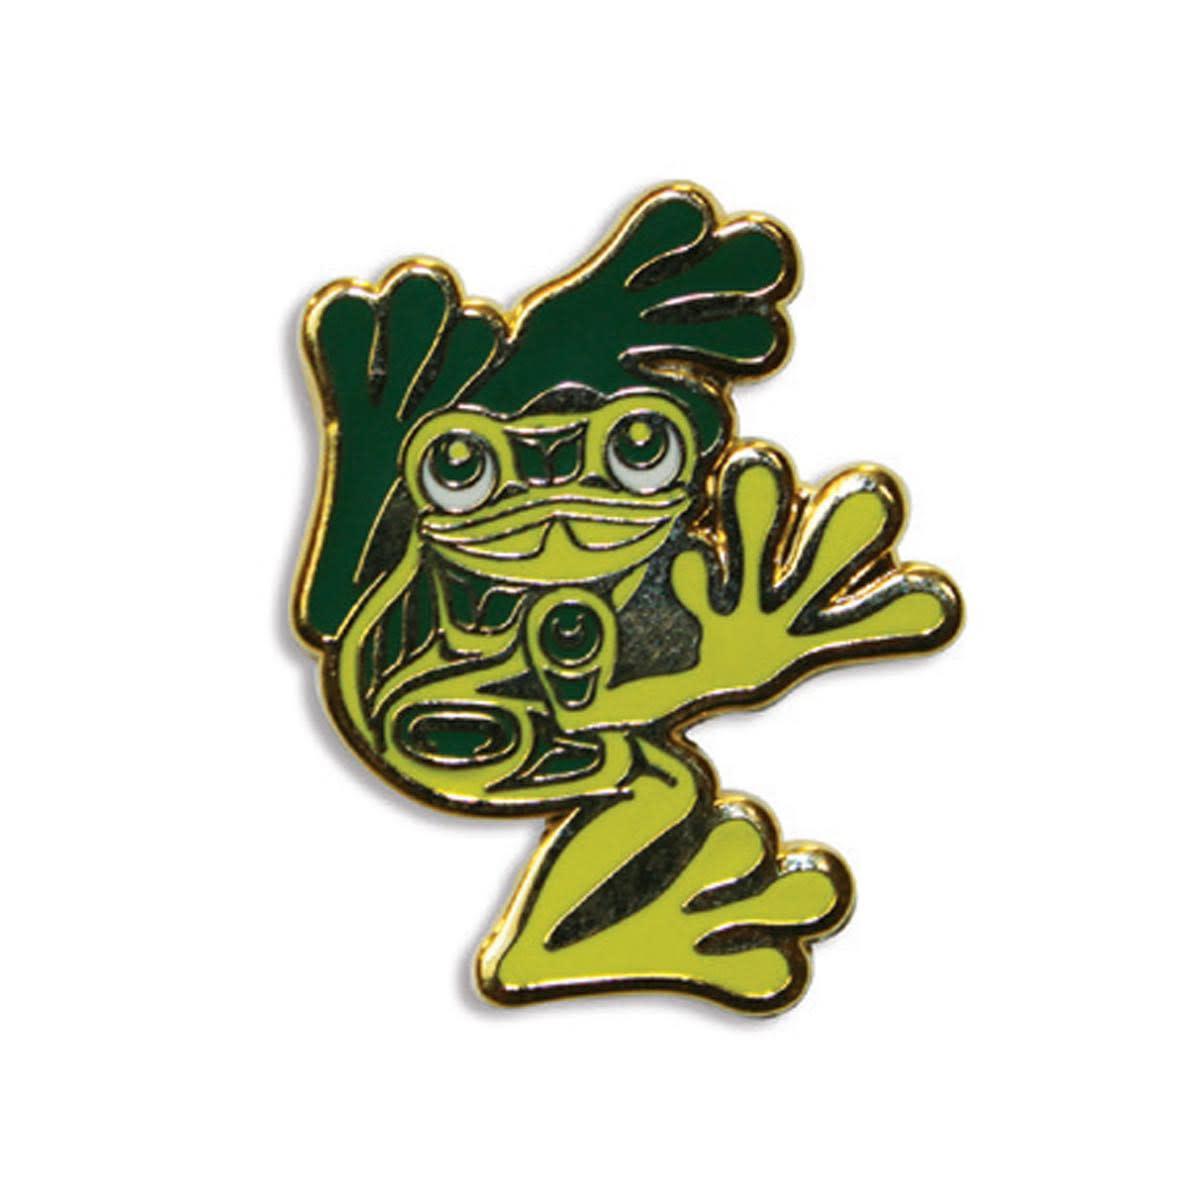 Enamel Pin Frog- Corey W. Moraes-1